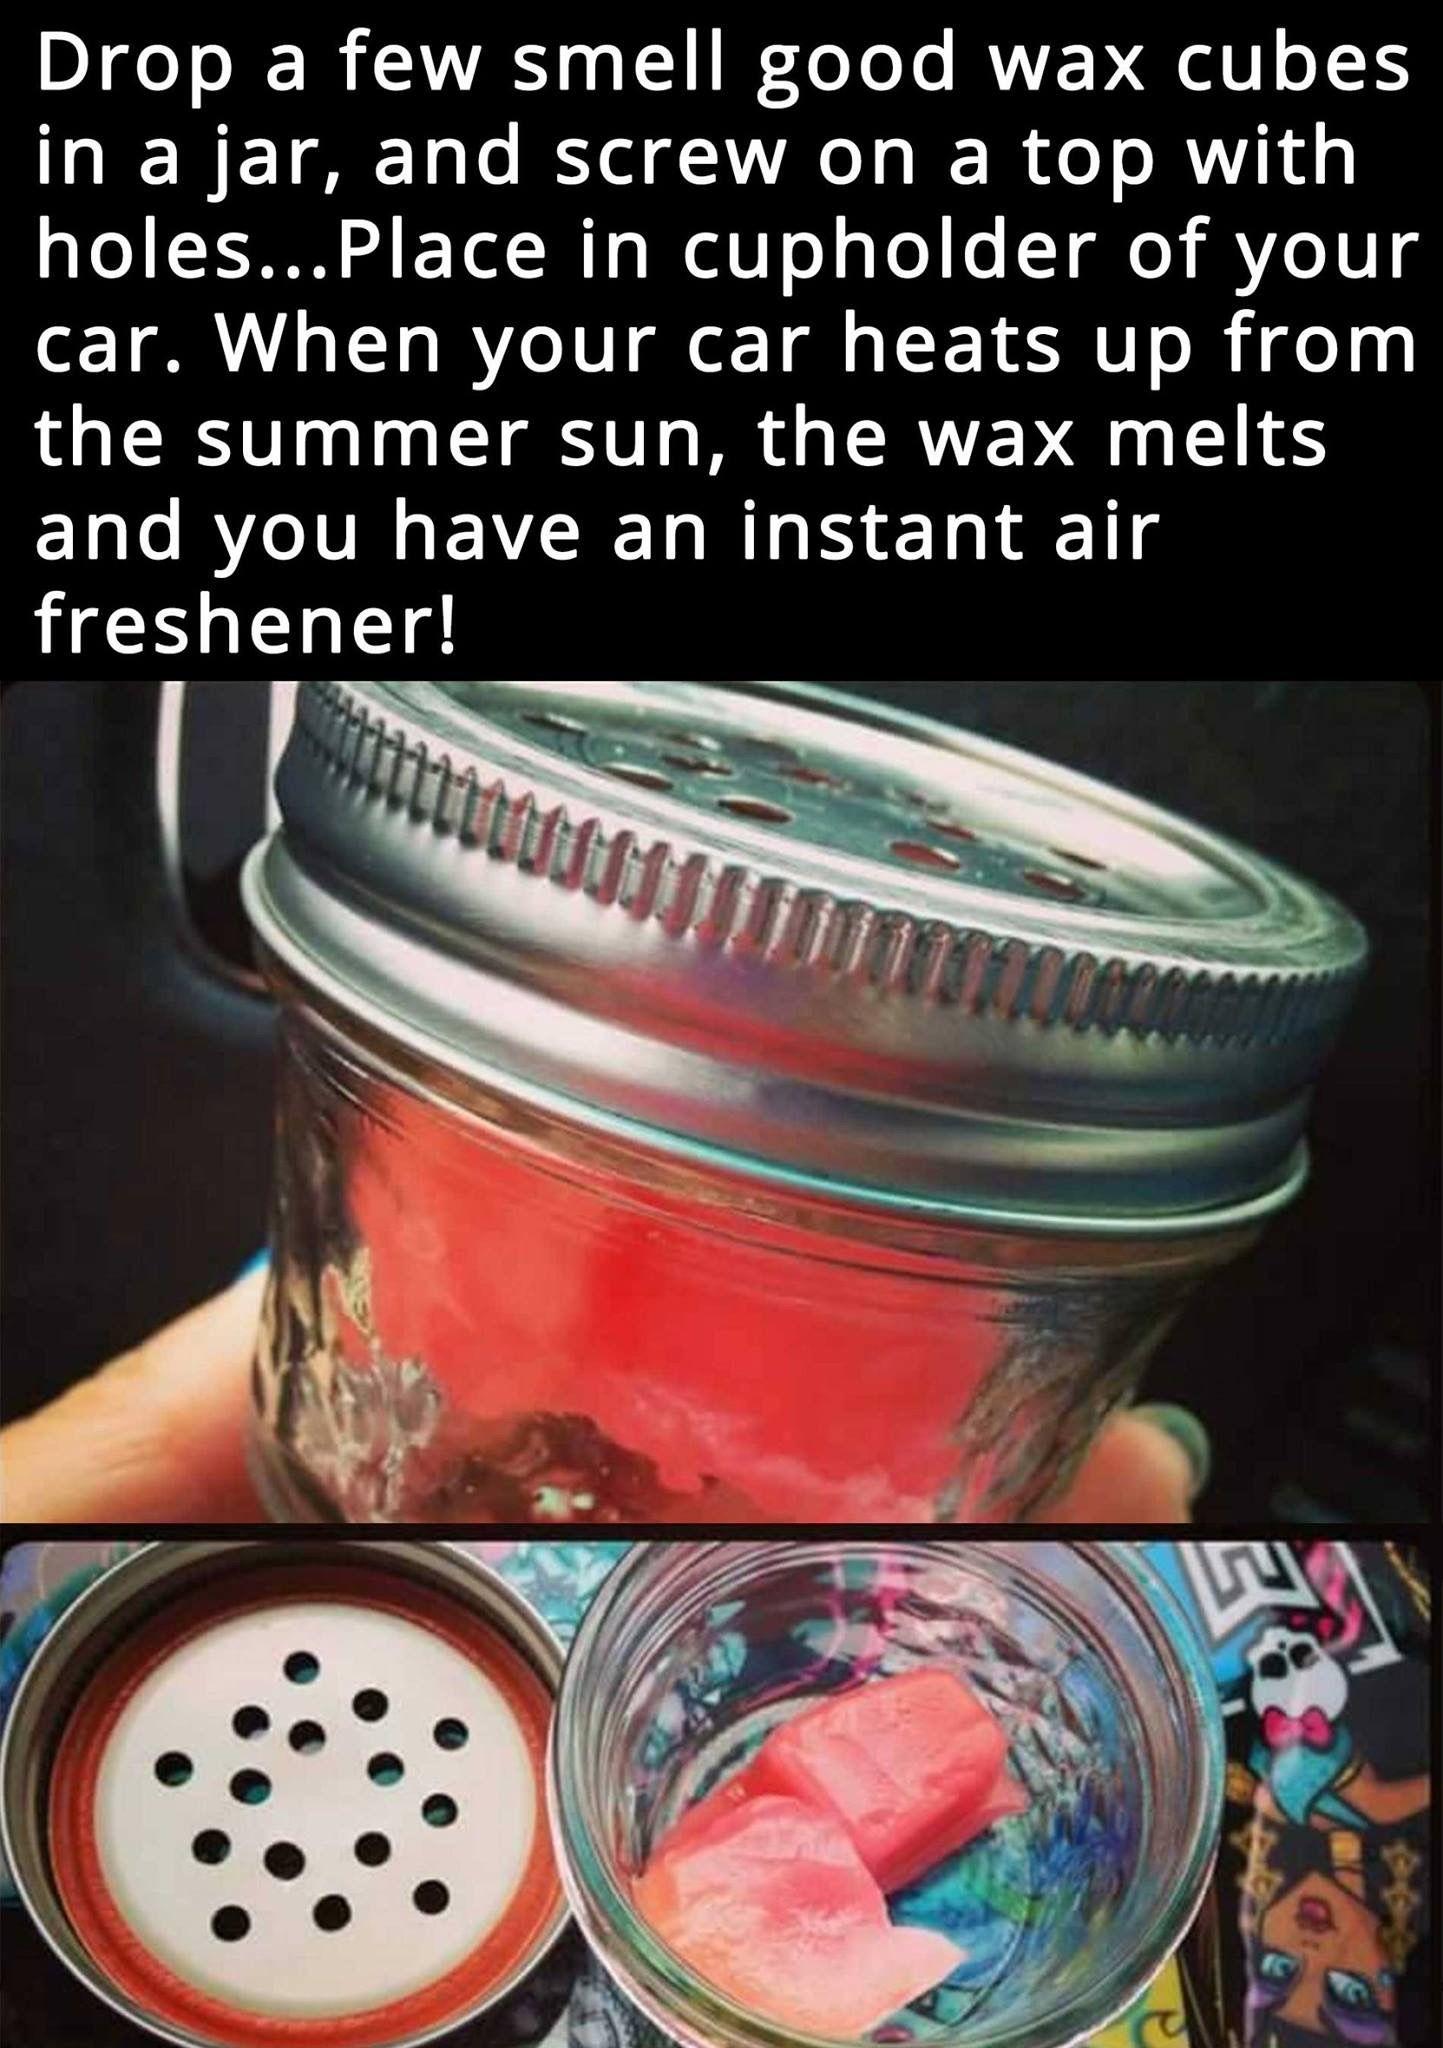 Car wax cubes Diy life hacks, Cleaning hacks, Smell good